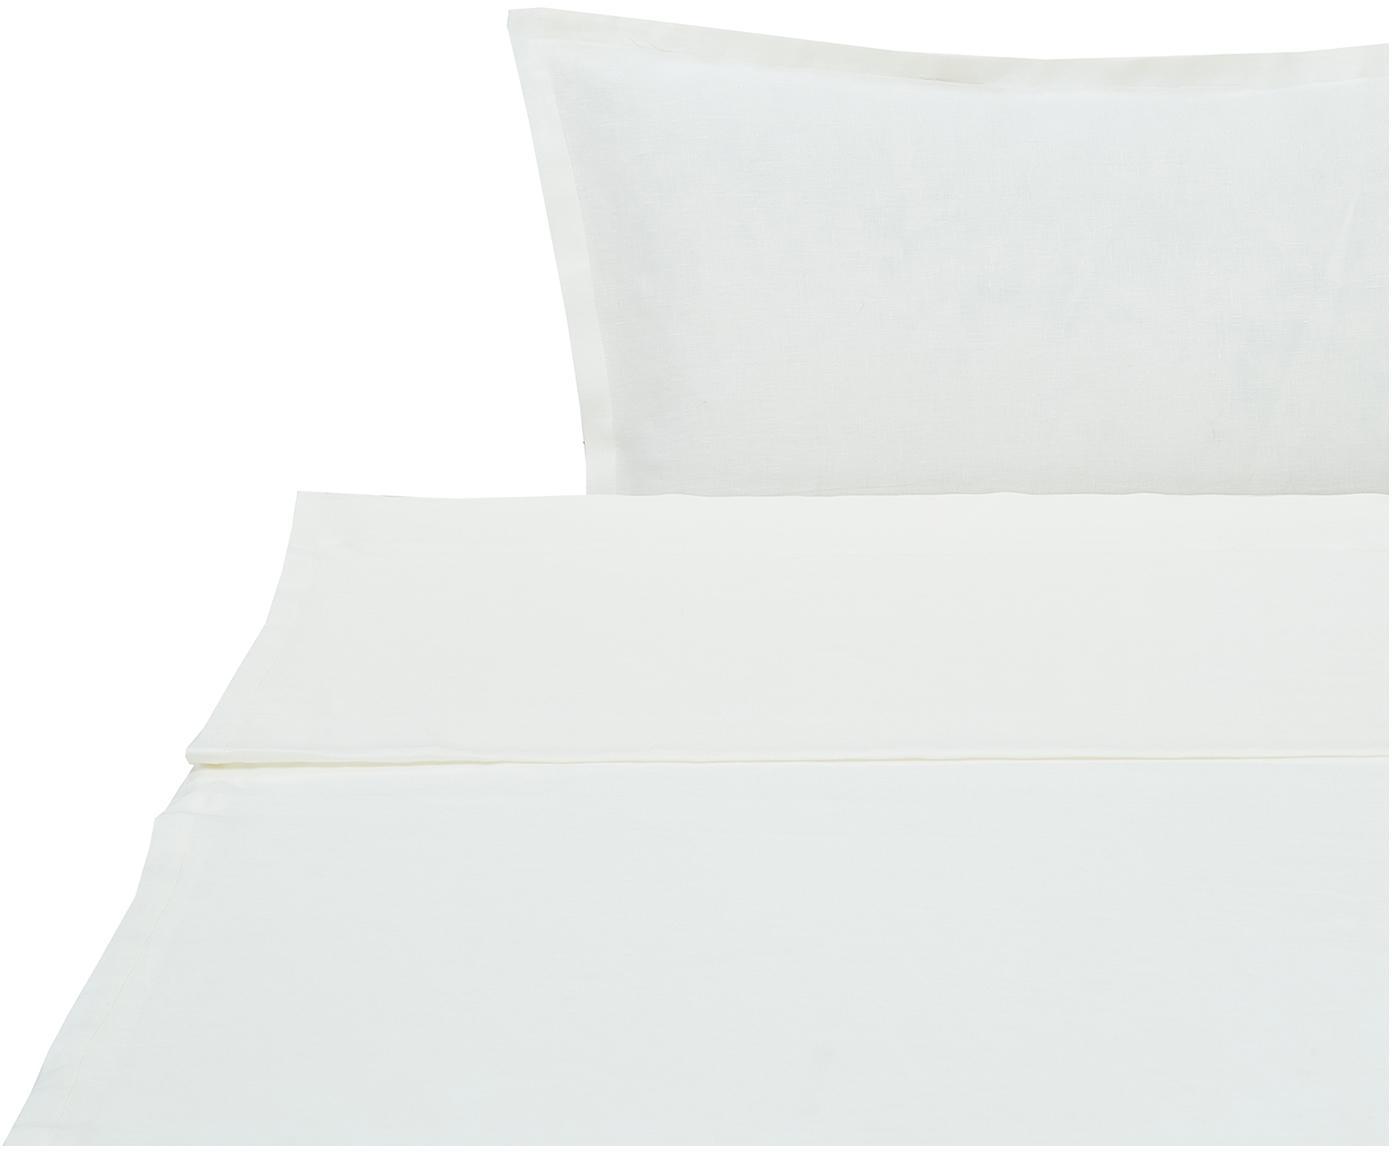 Set lenzuola in lino Soffio 3 pz, Crema, 260 x 295 cm